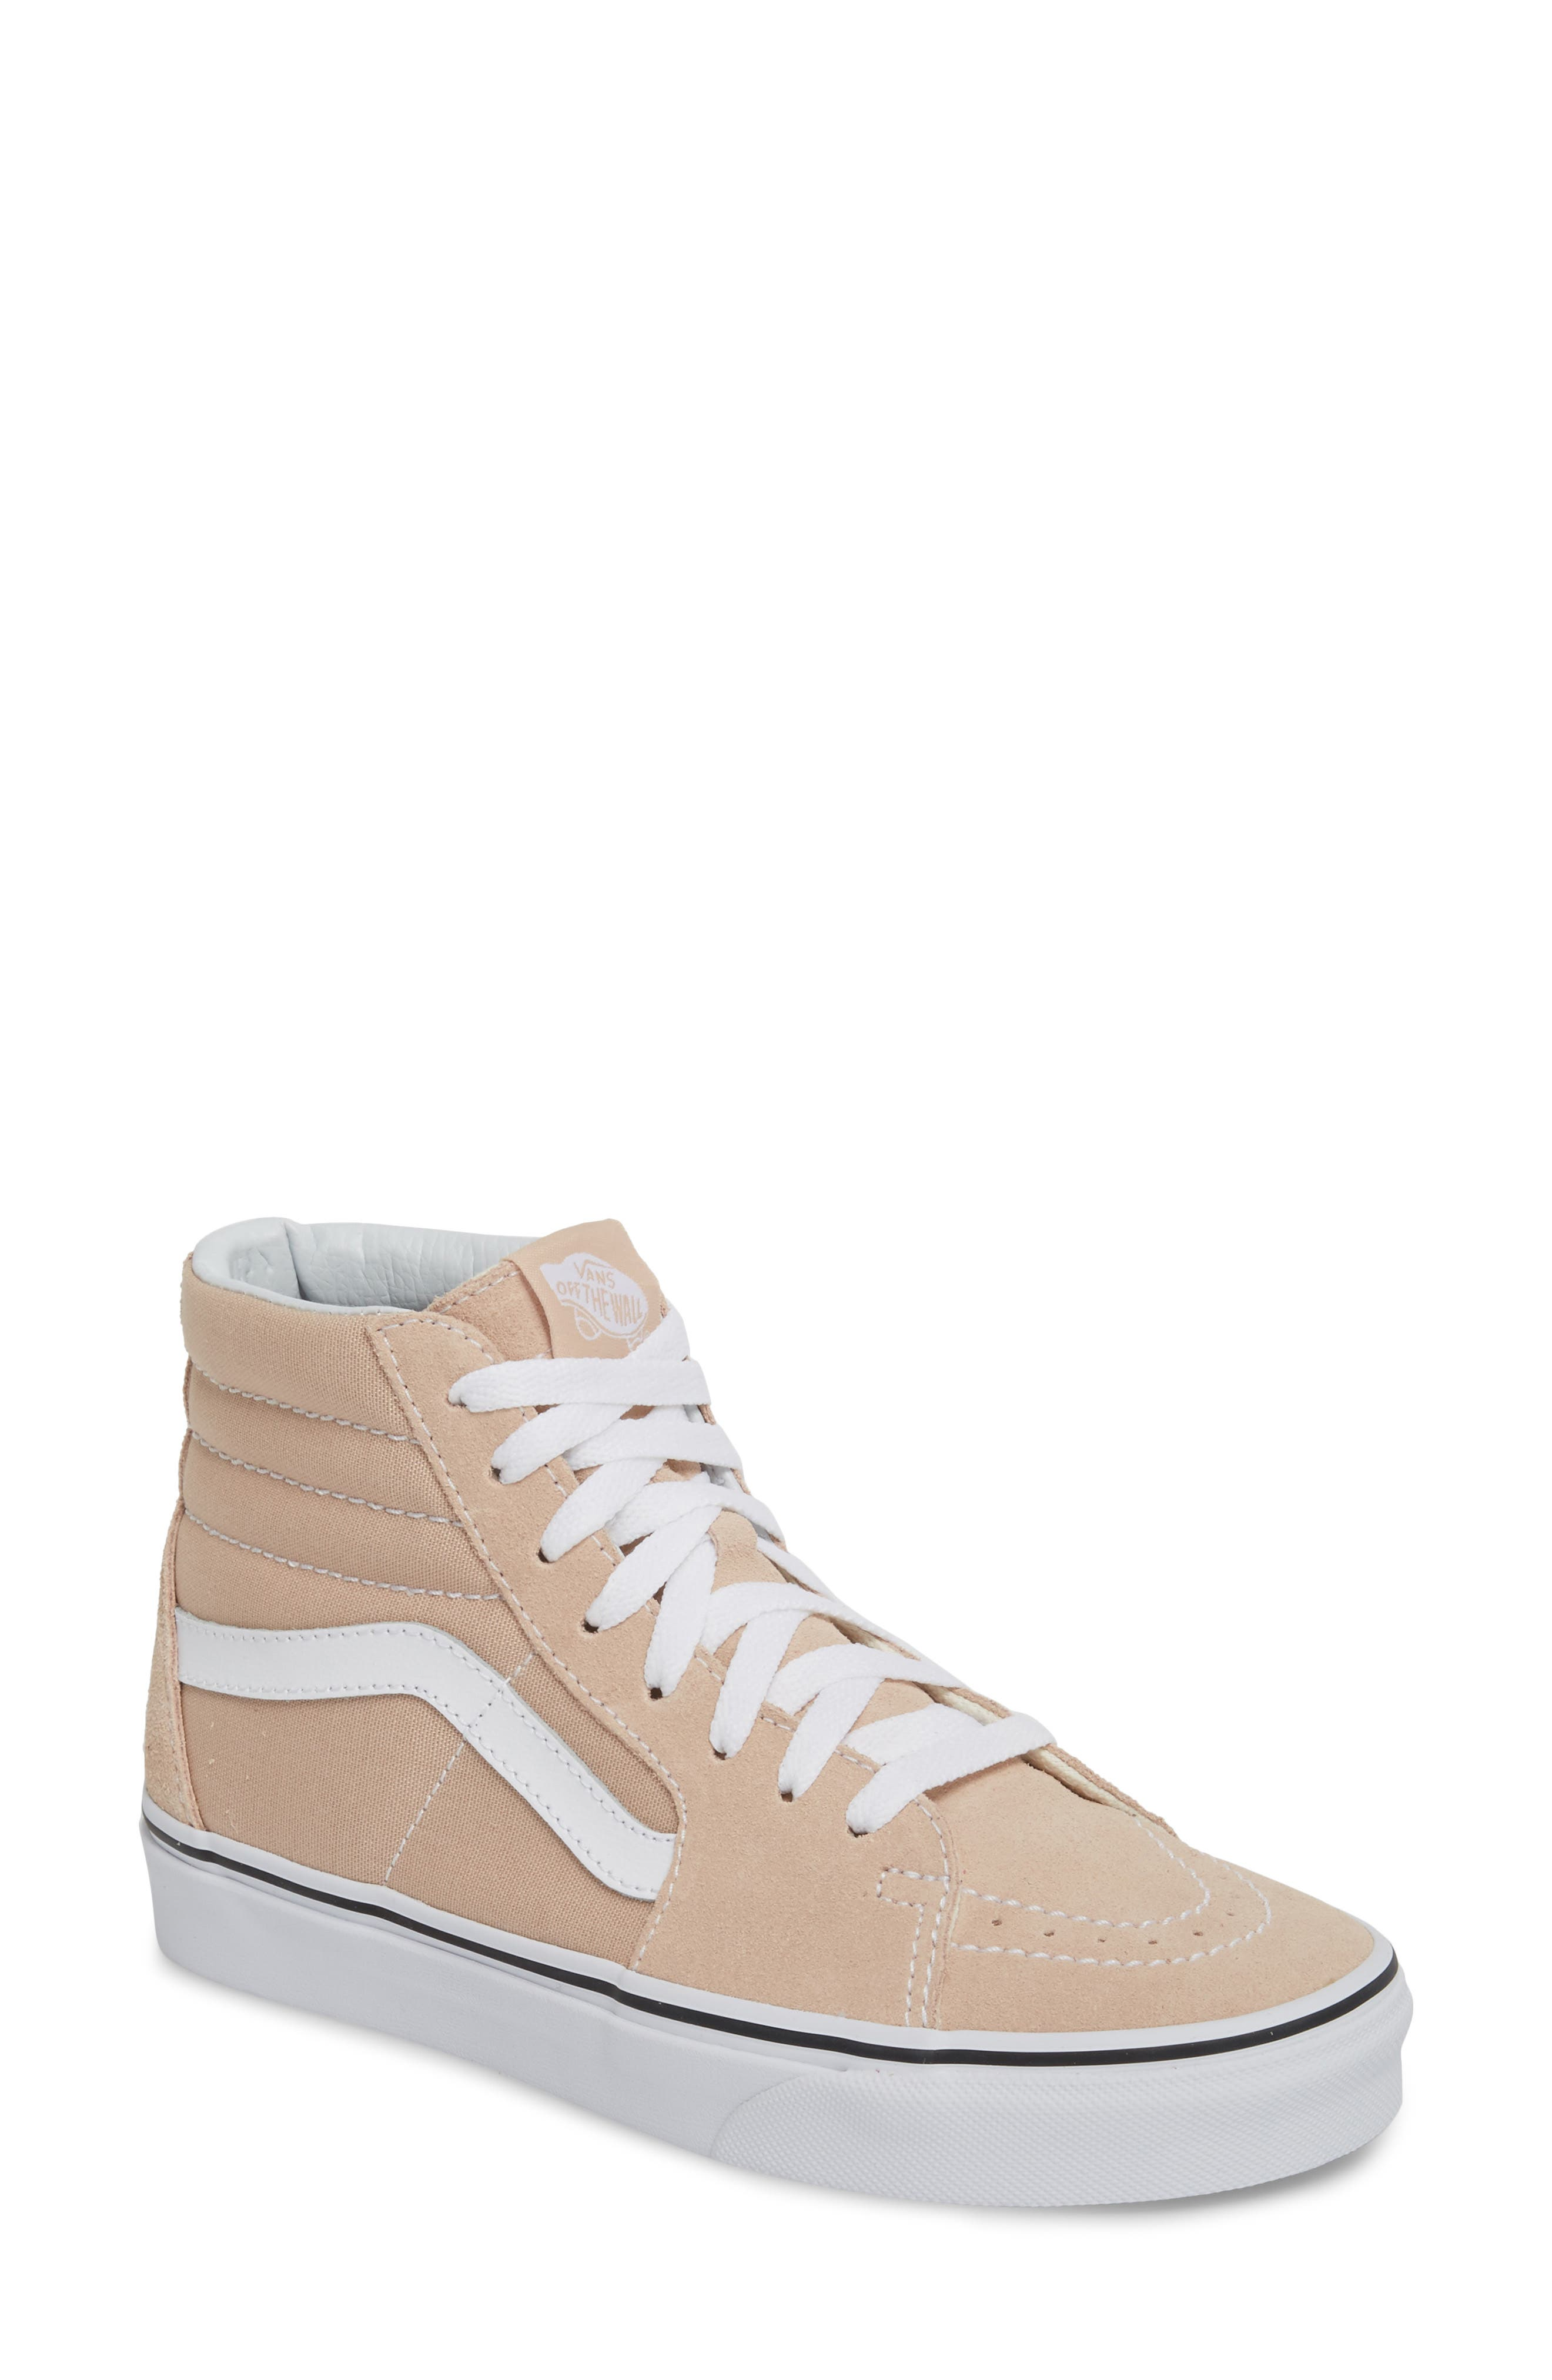 'Sk8-Hi Slim' Sneaker,                             Main thumbnail 1, color,                             Frappe/ True White